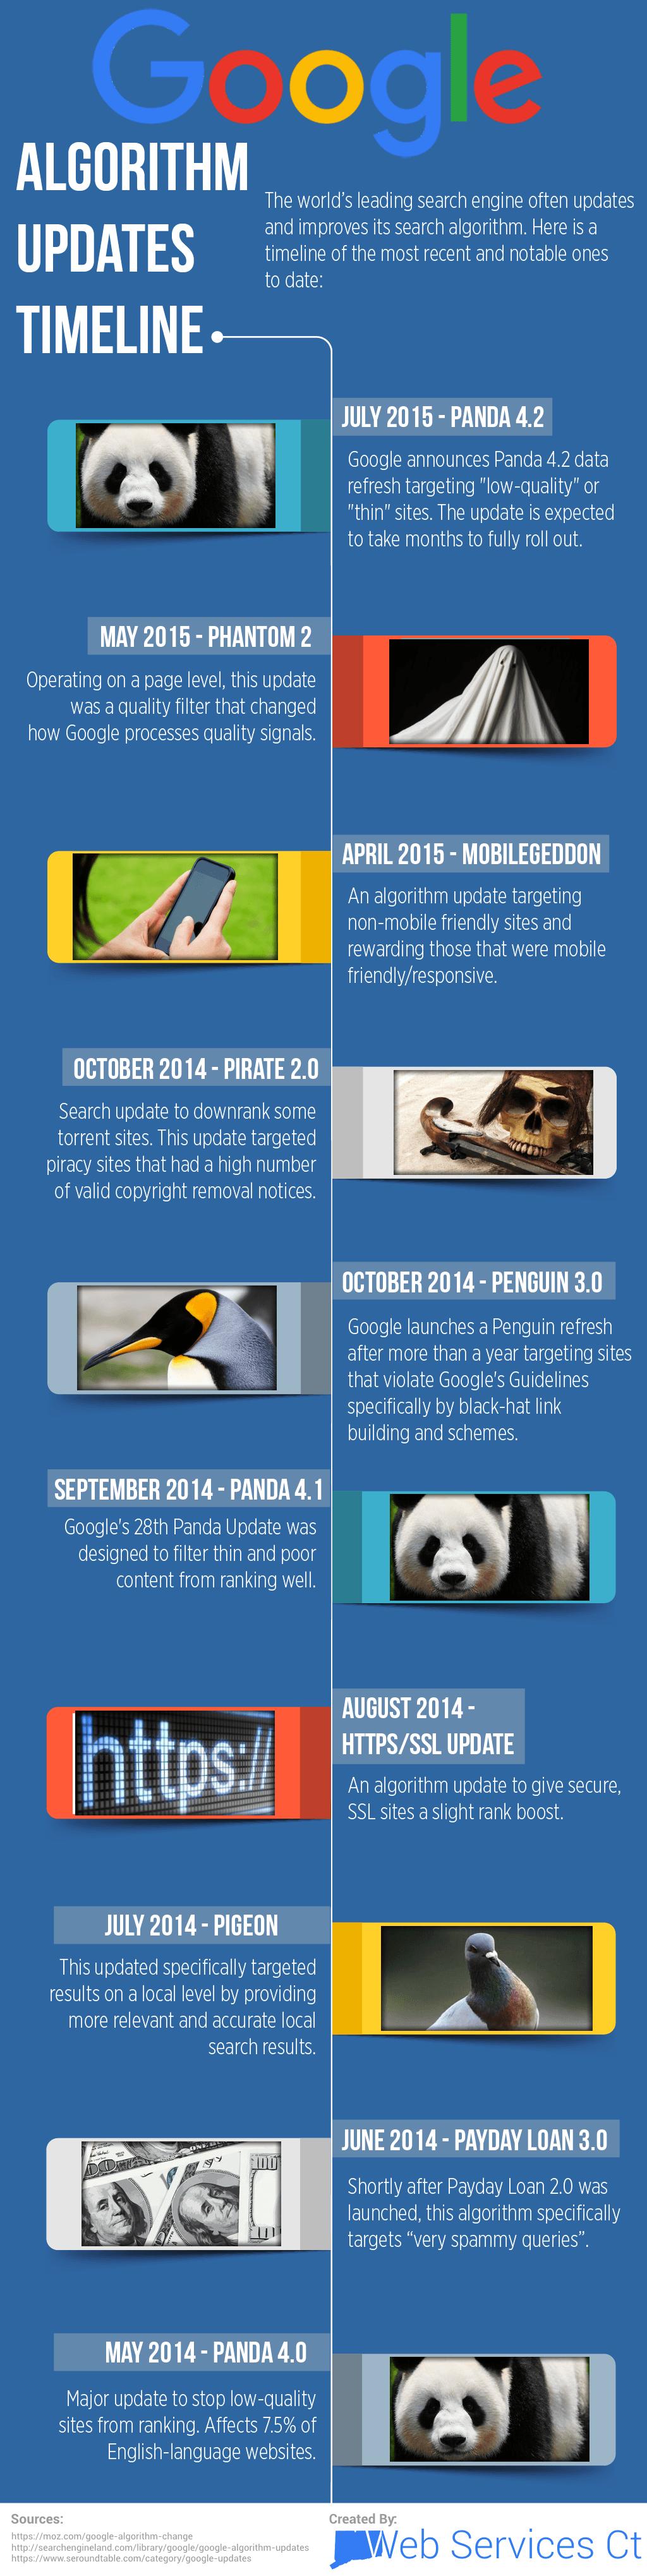 Google Algorithm Updates Timeline 2015 Infographic